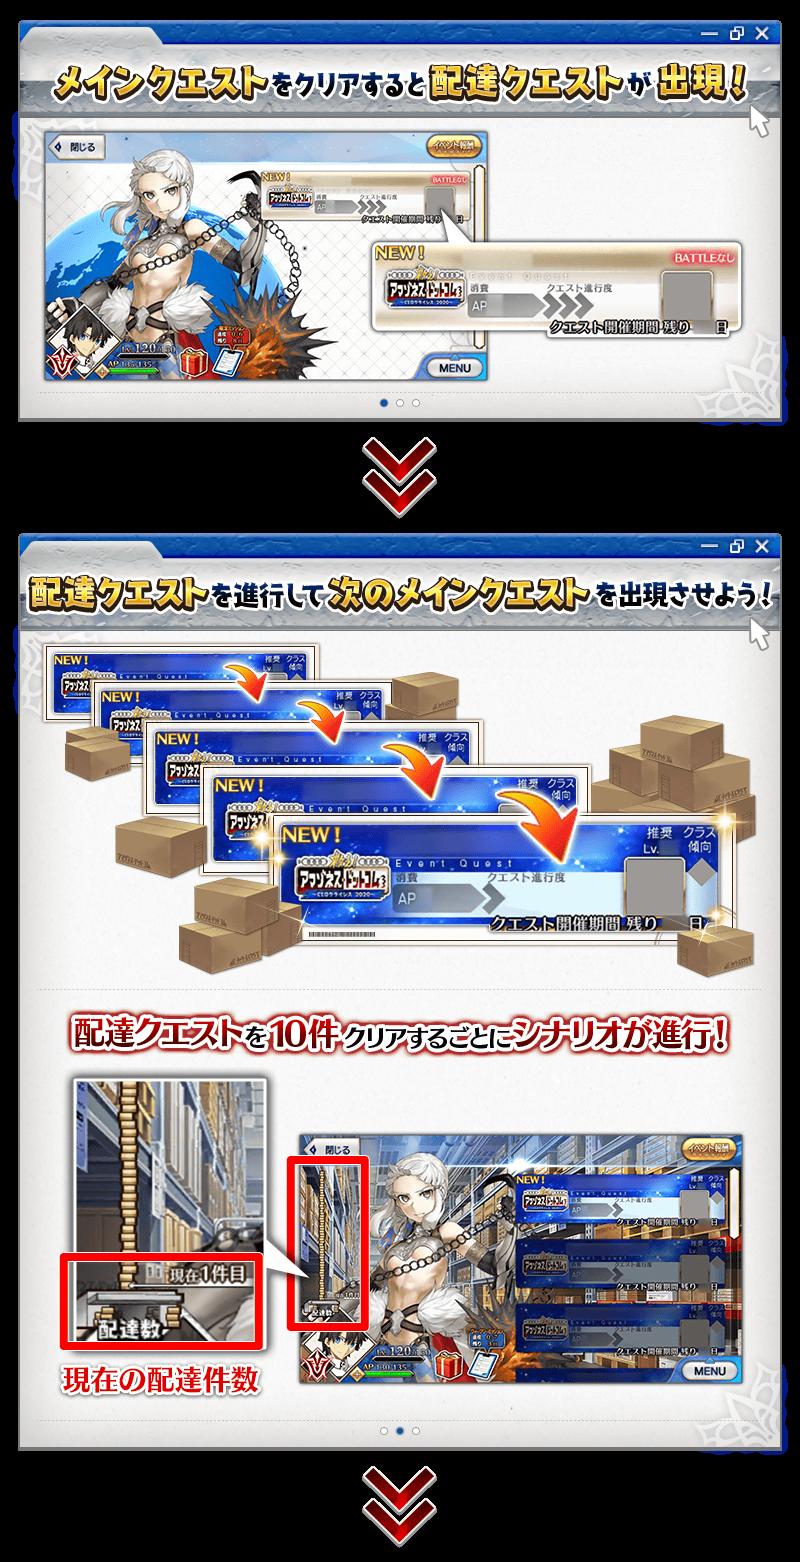 info_image_15